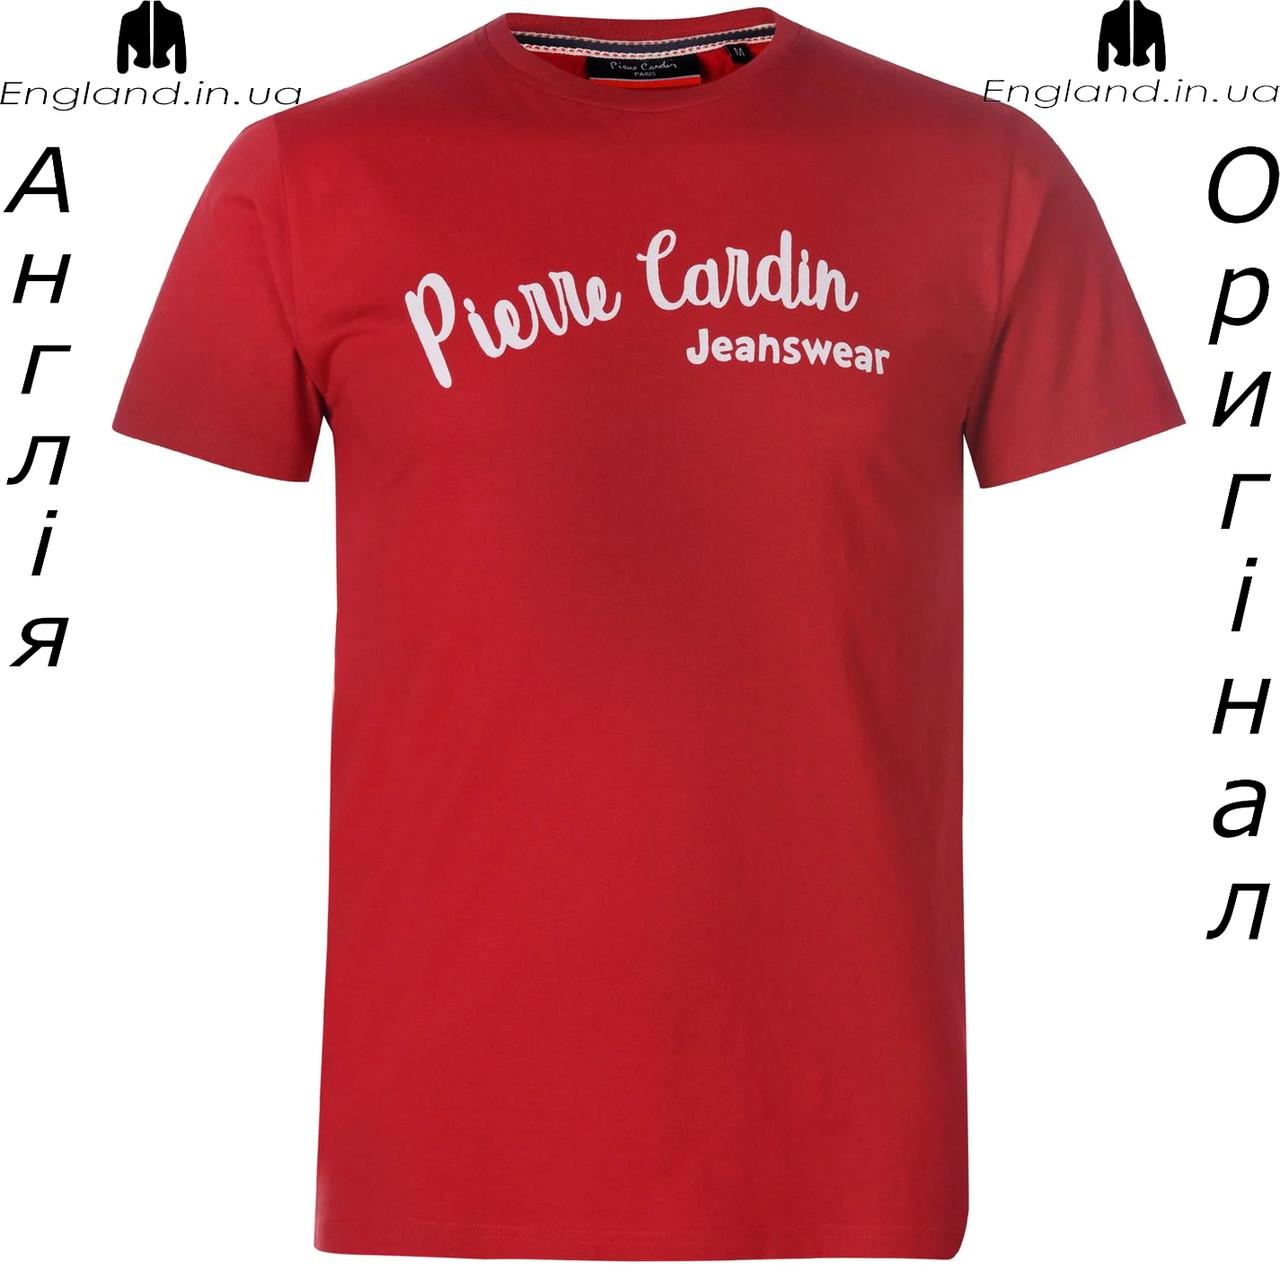 Футболка мужская Pierre Cardin из Англии - на короткий рукав